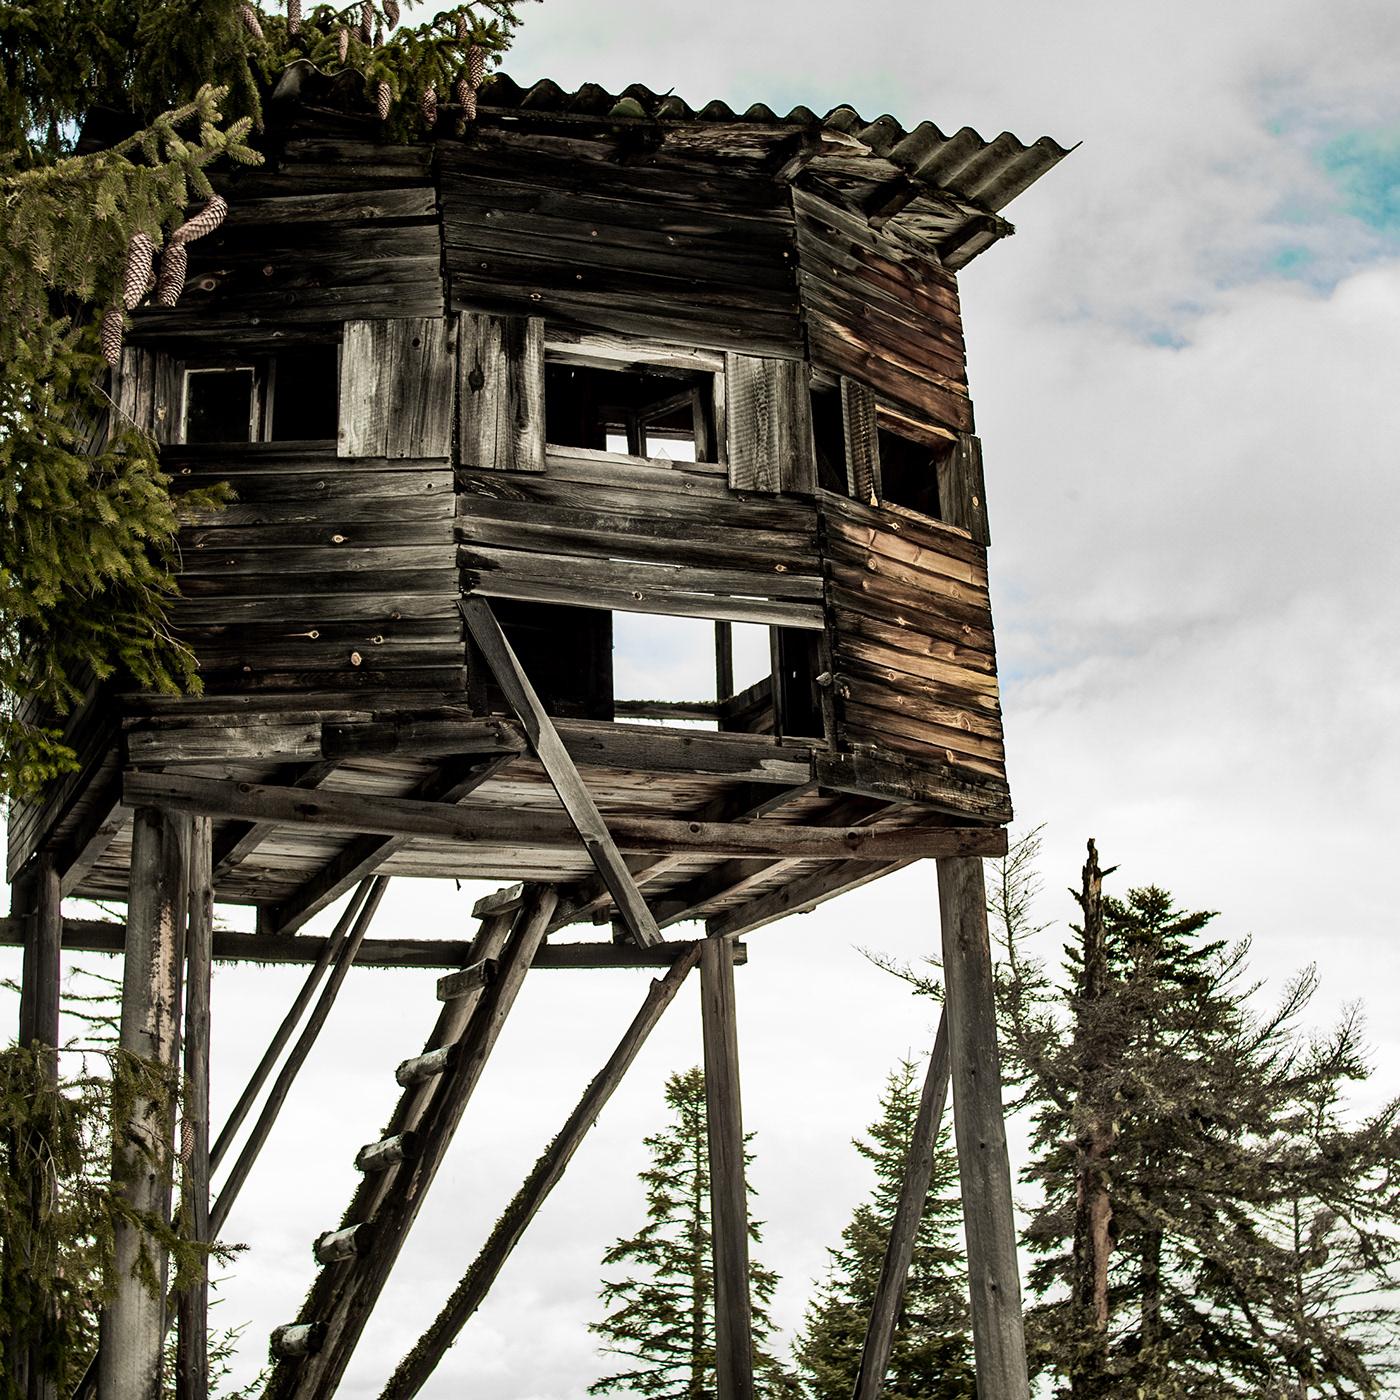 Watch Tower or Hunters Hide?